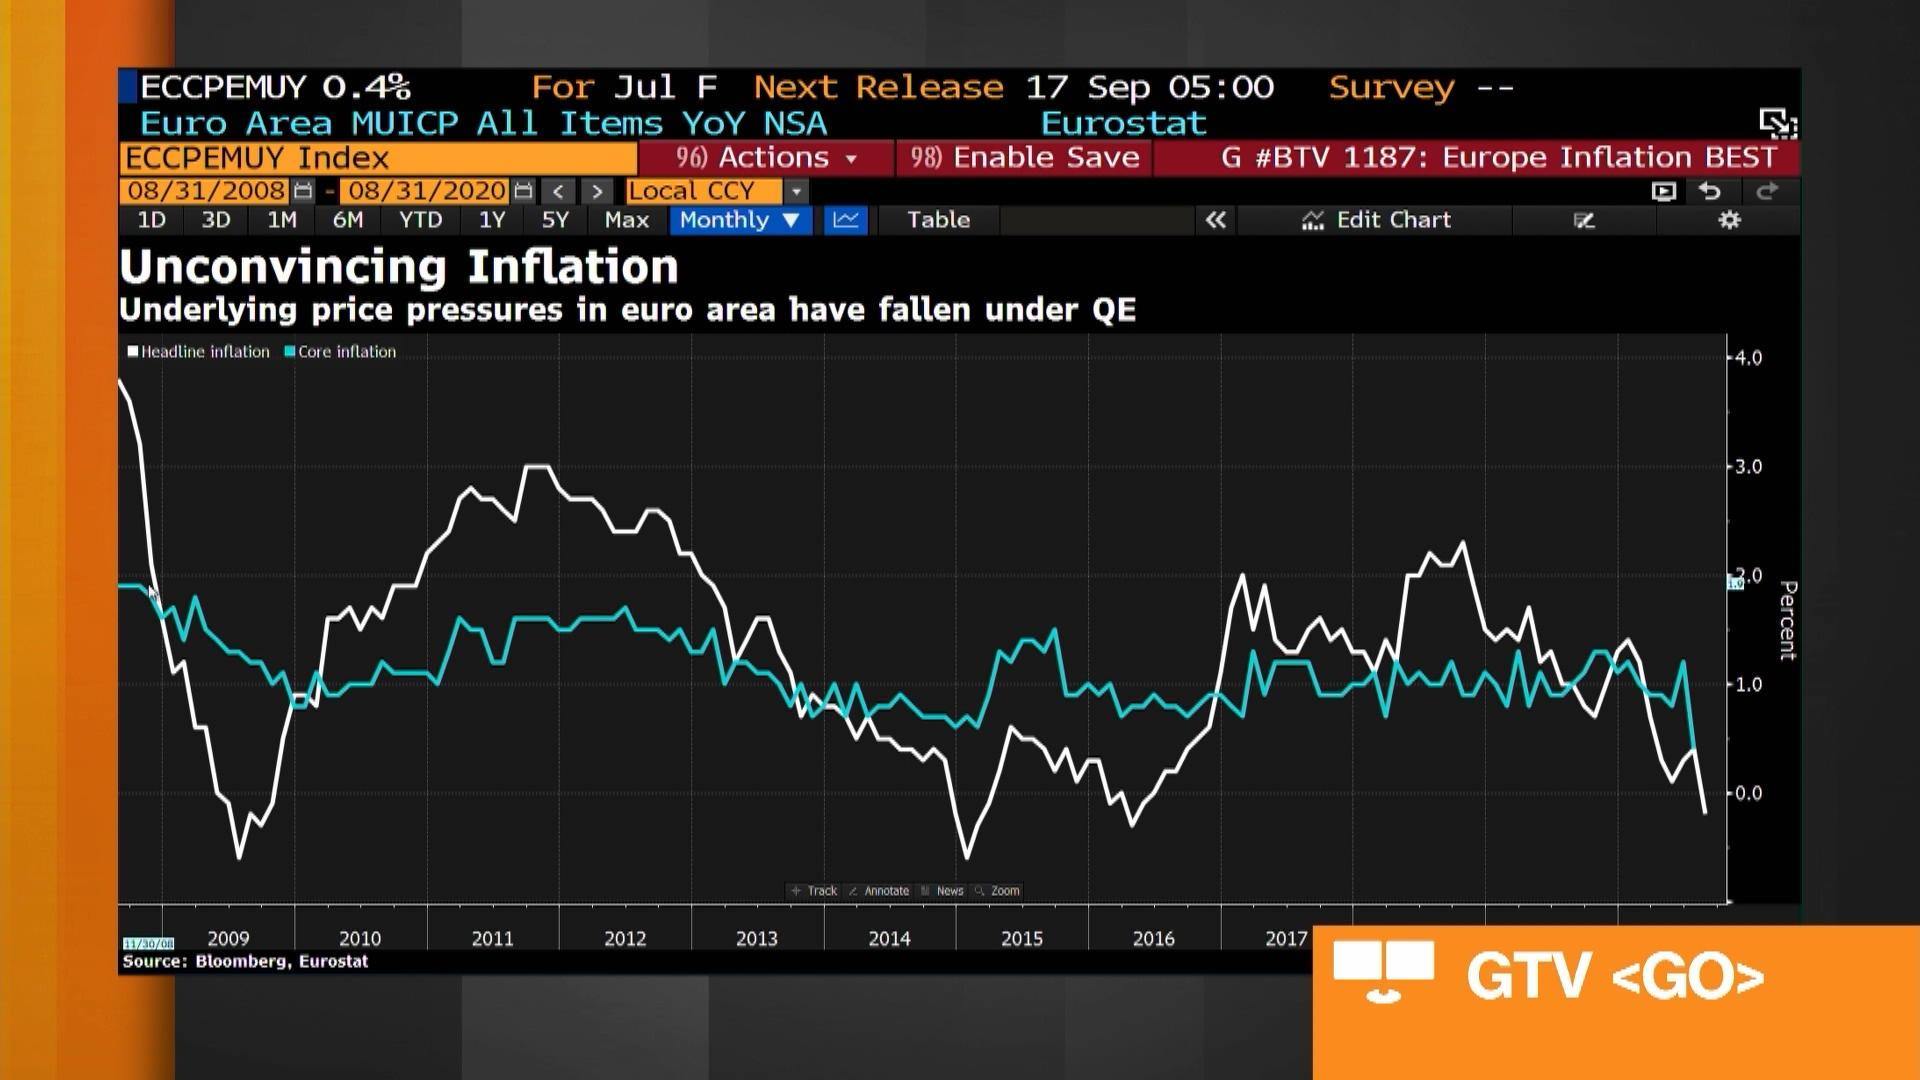 TD Securities' Pooja Kumra on ECB Activity